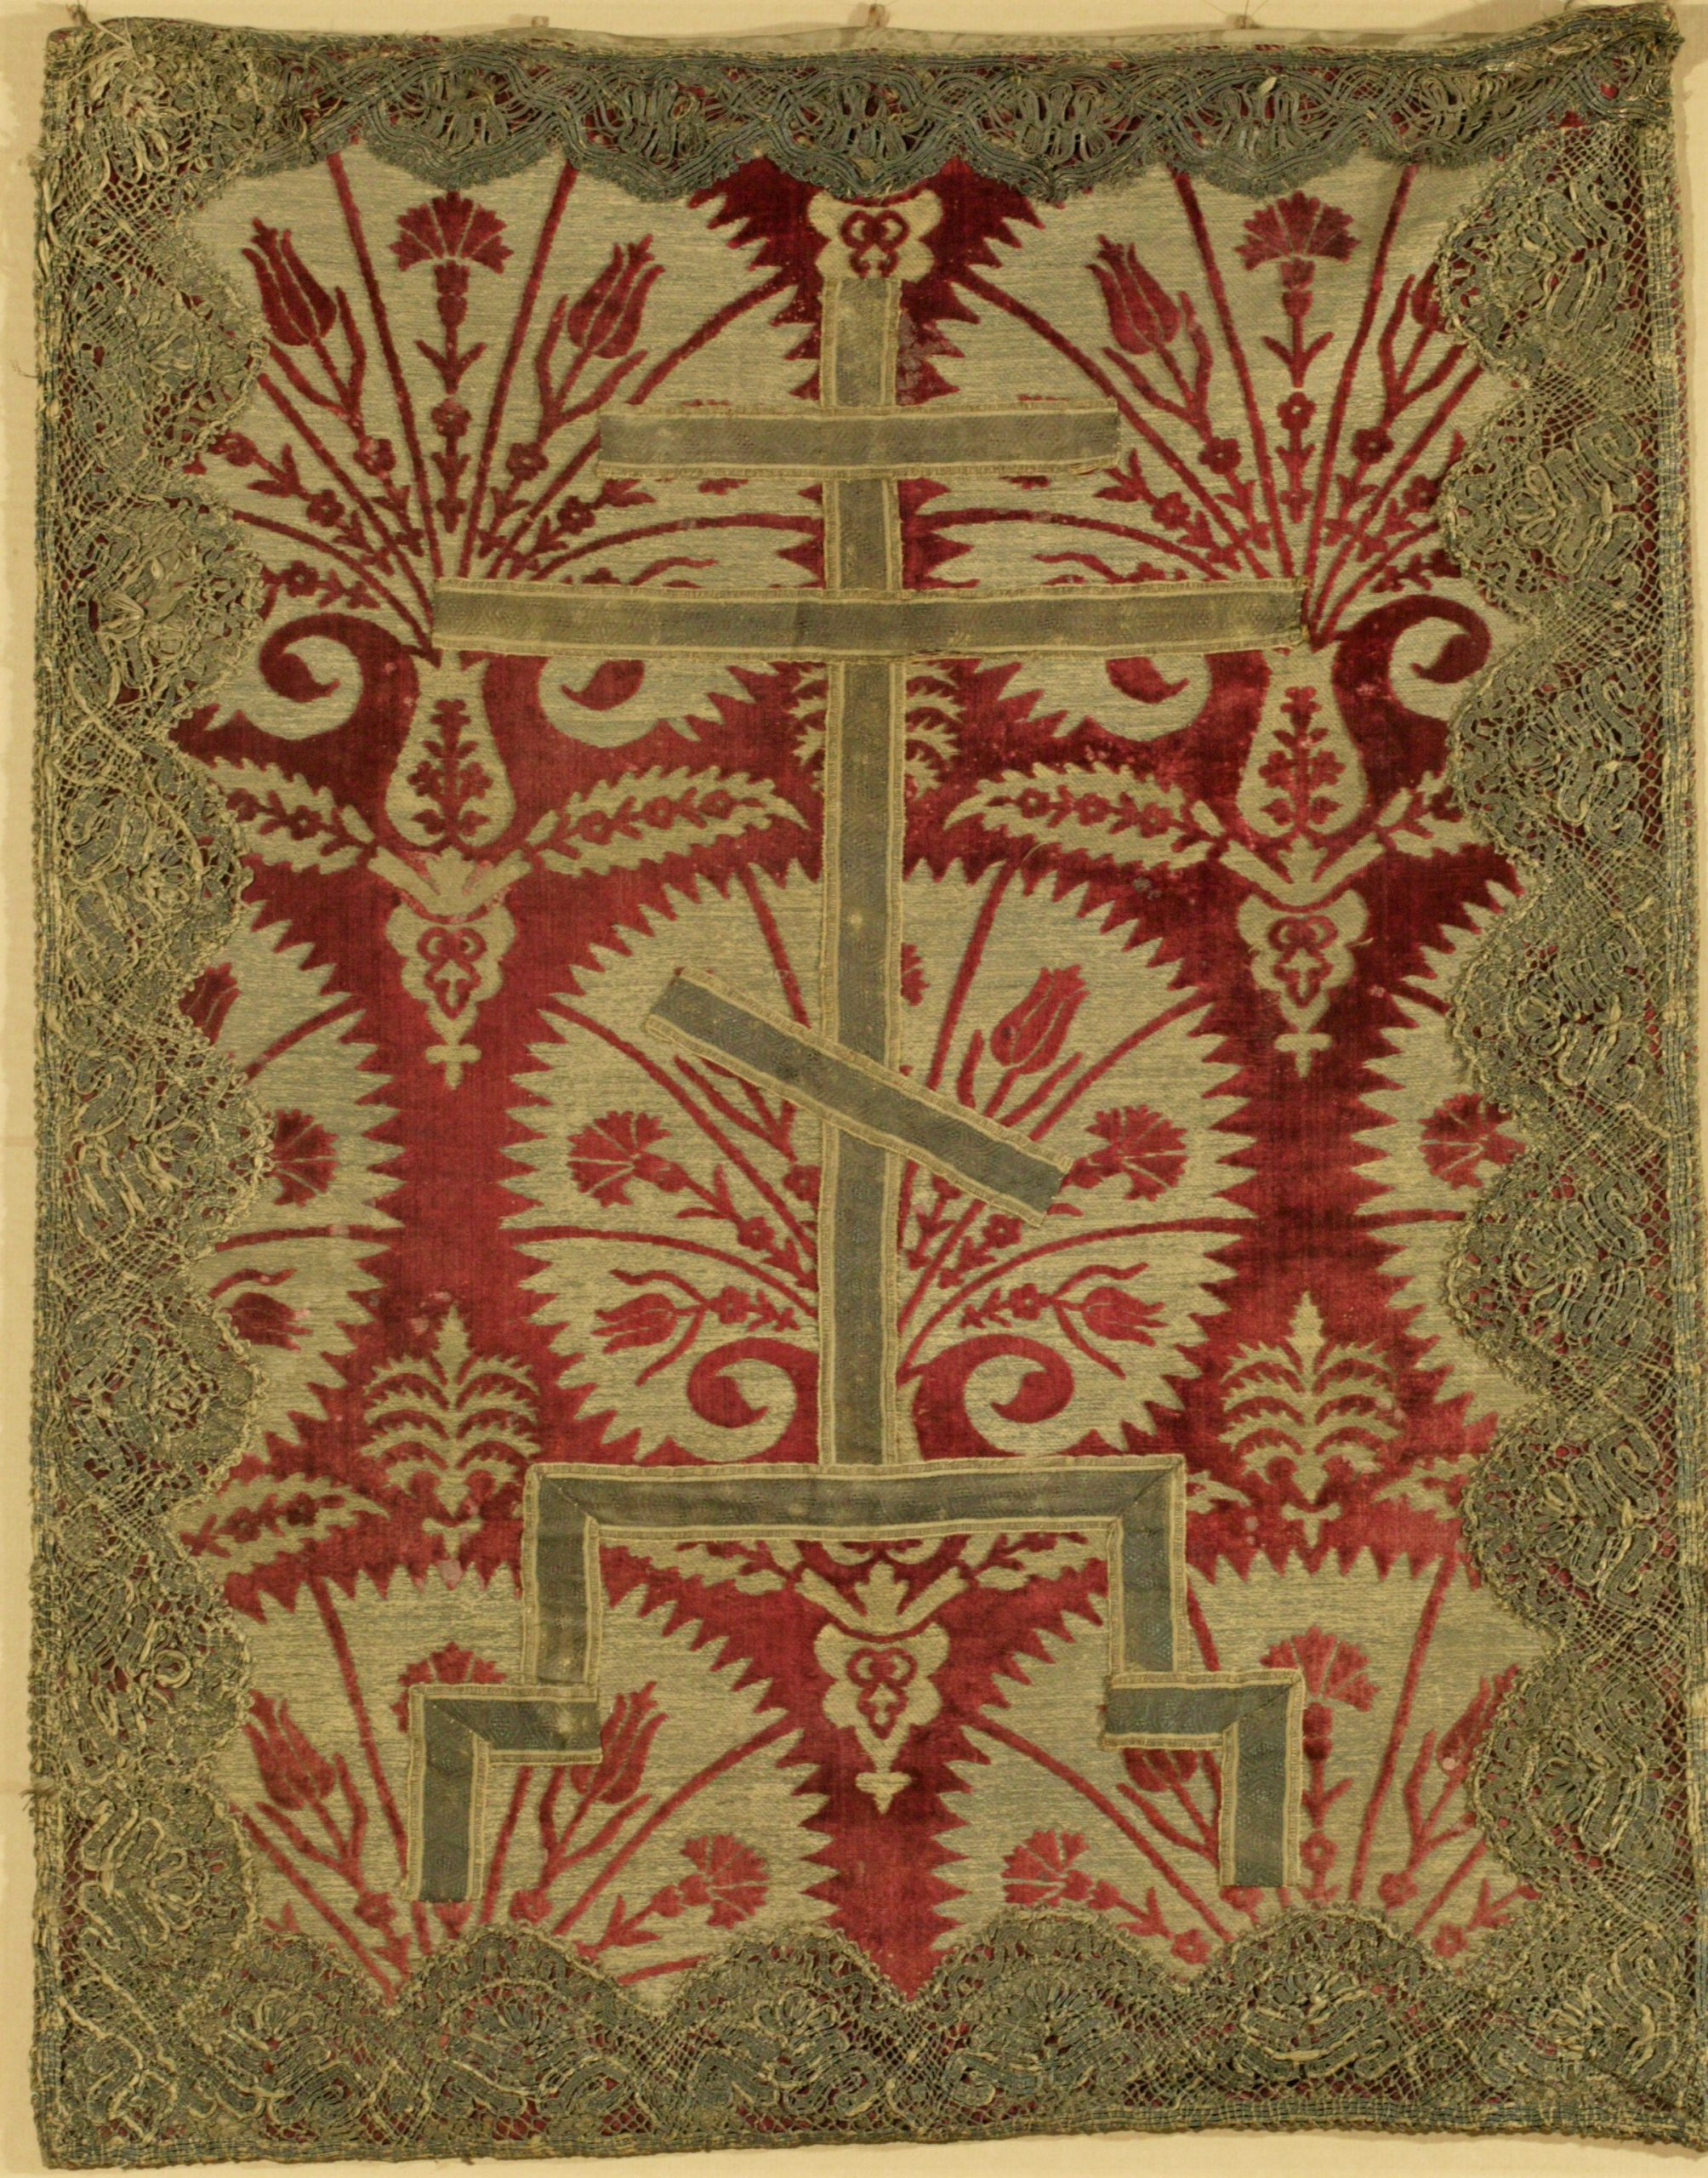 Пелена с орнаментом «опахалы»